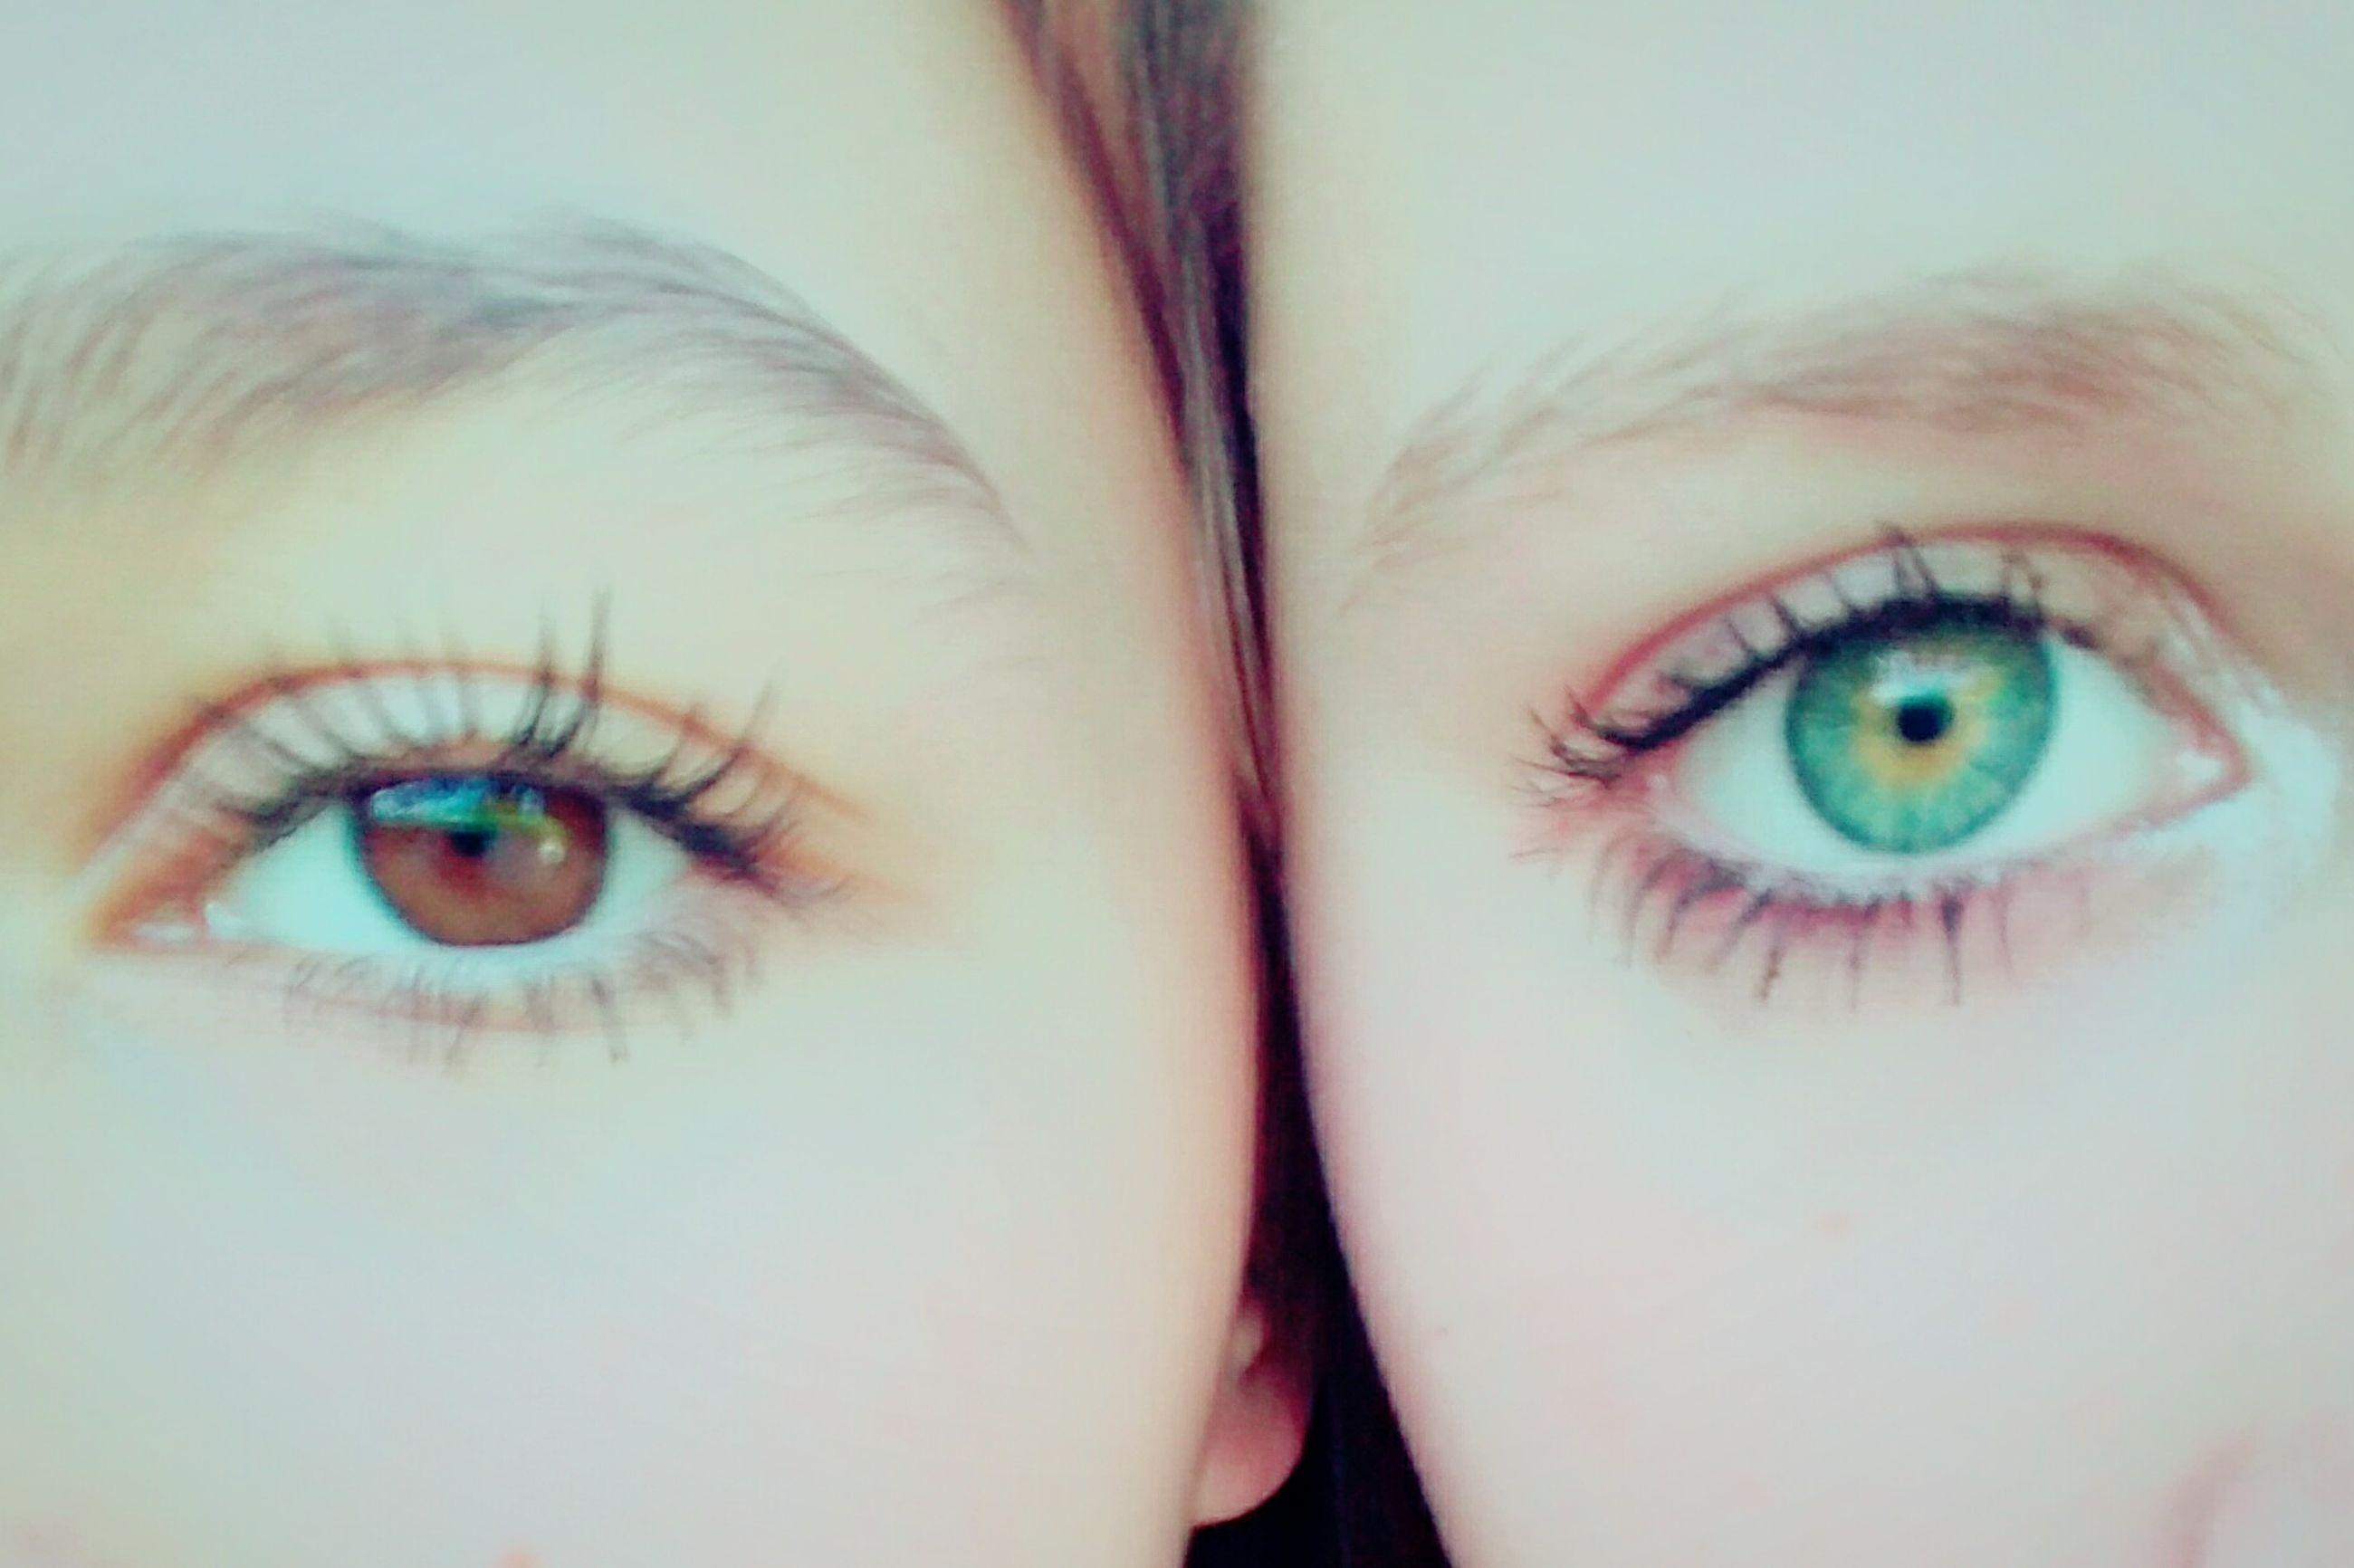 human eye, looking at camera, lifestyles, person, leisure activity, close-up, indoors, blue eyes, portrait, full frame, eyelash, eyesight, green eyes, young adult, eyeshadow, human face, eyeball, eyebrow, multi colored